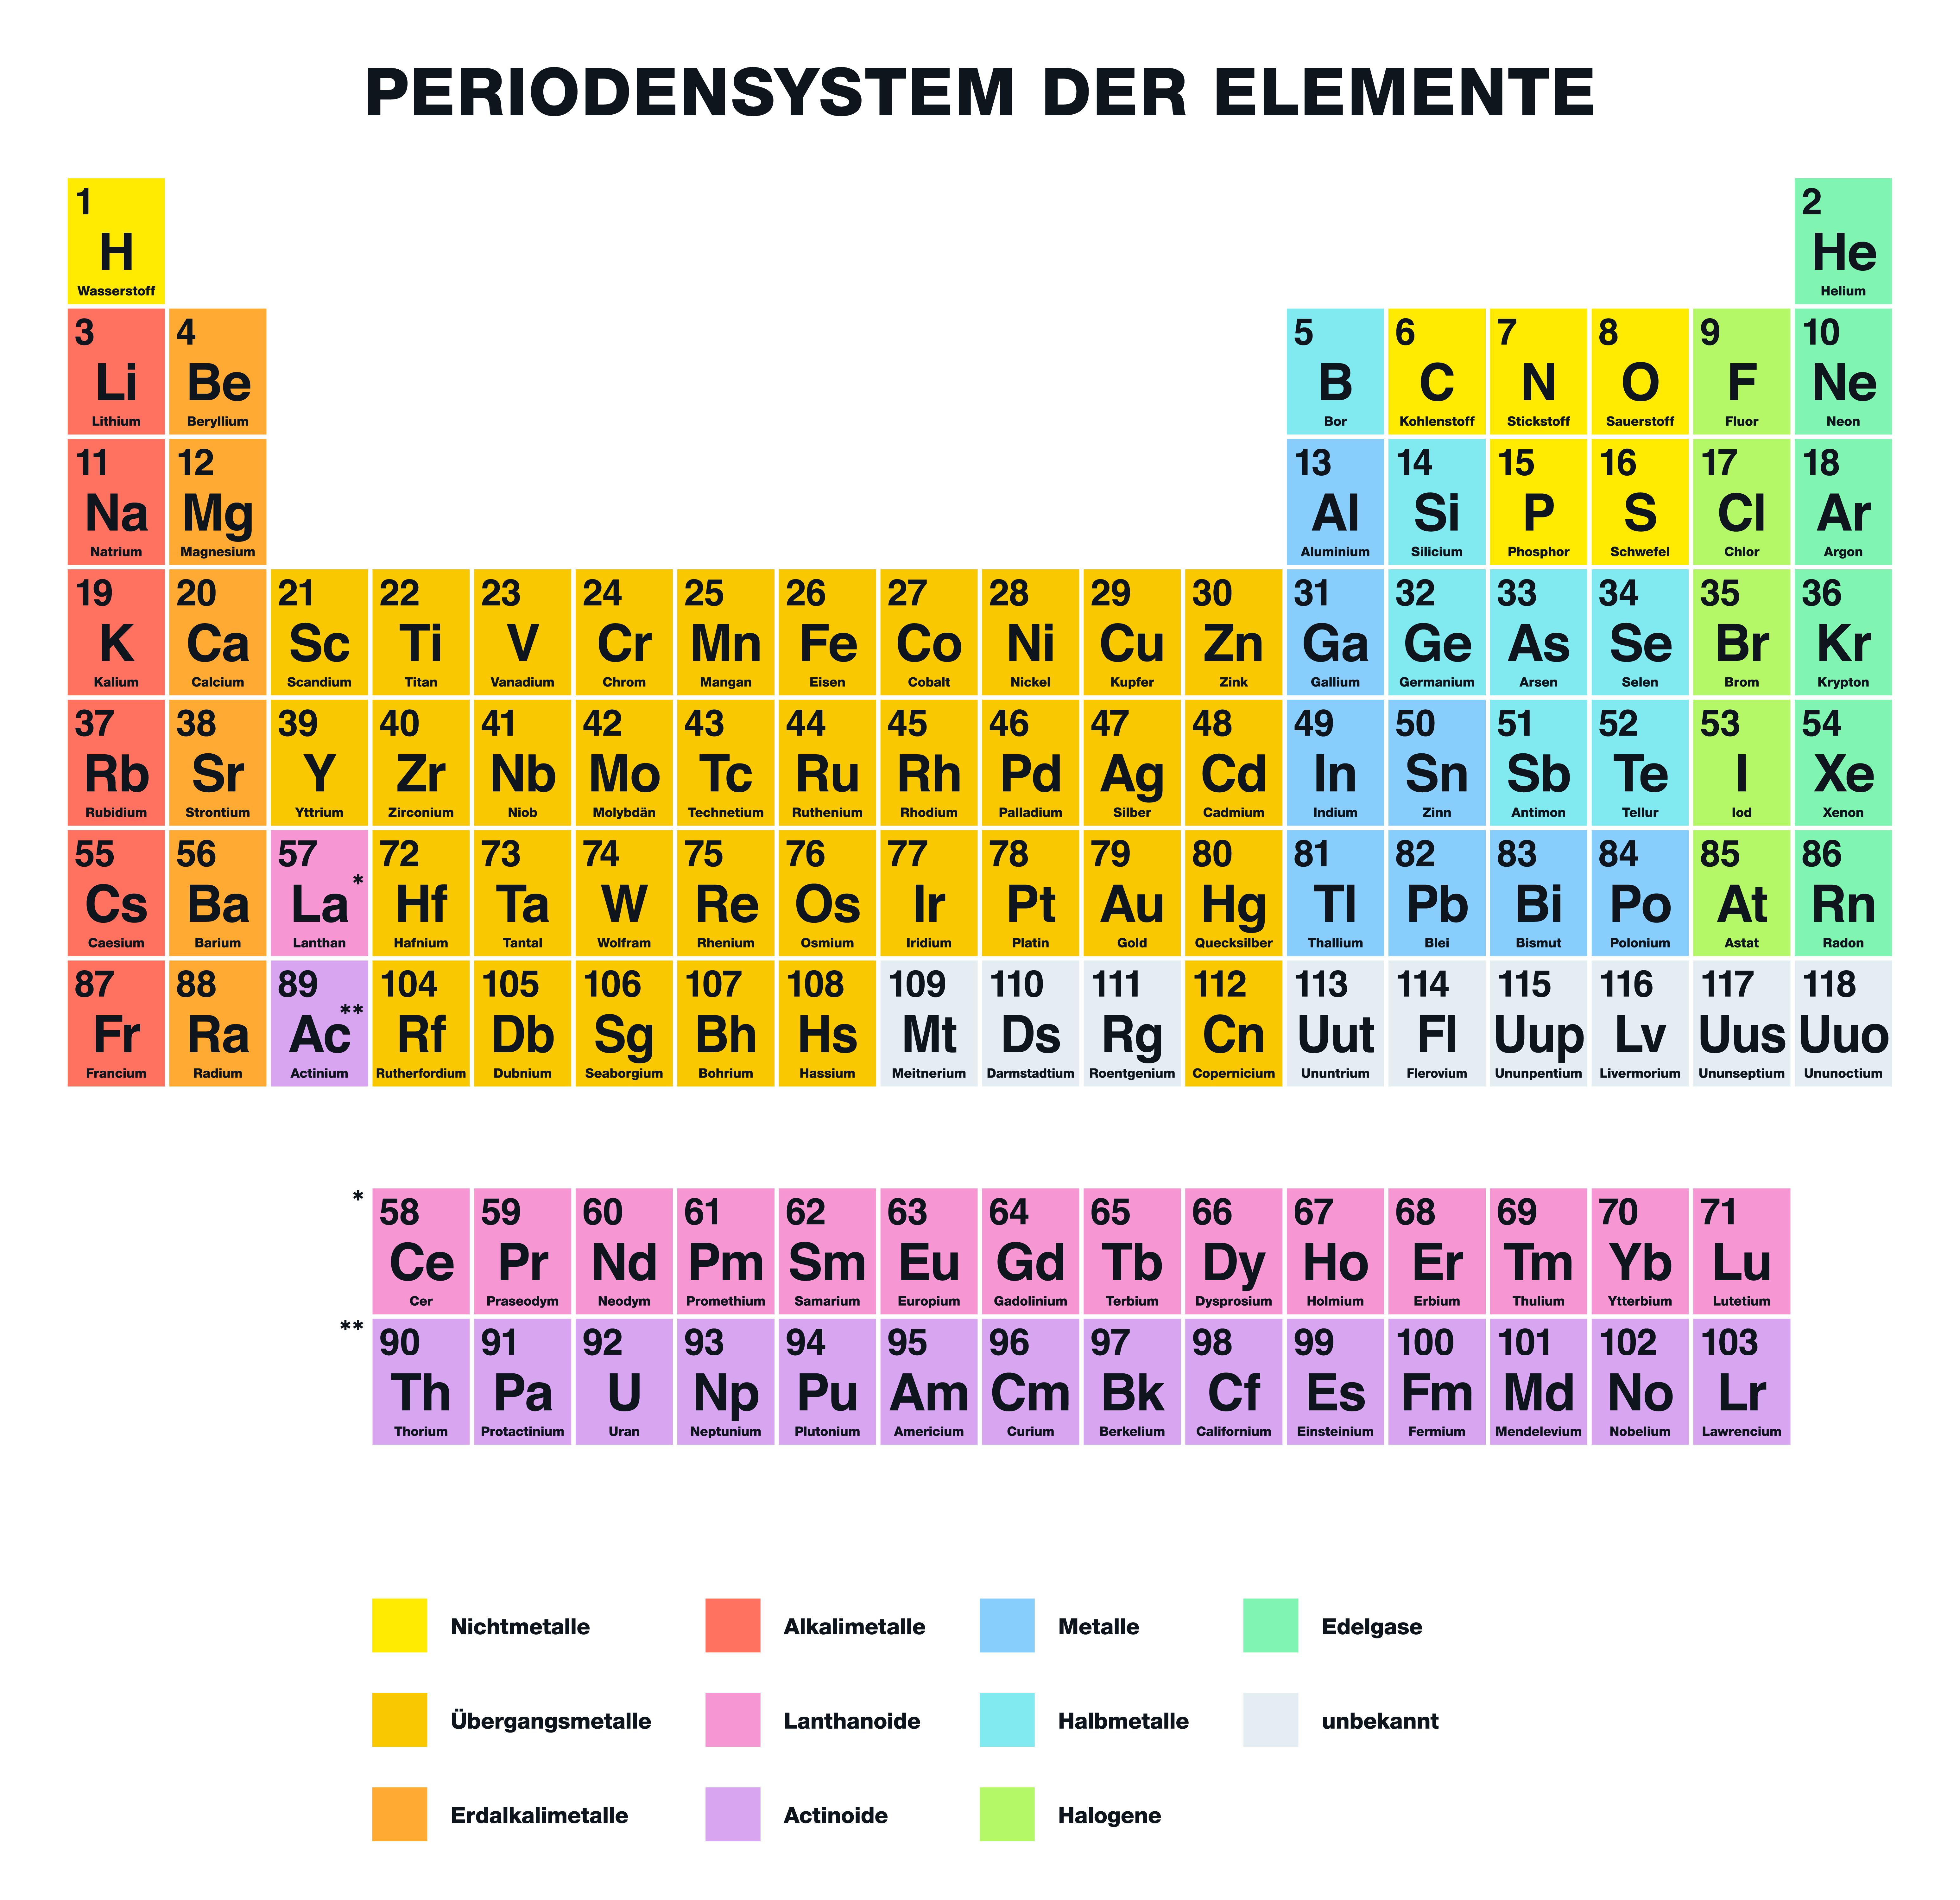 Periodensystem der elemente wir erkl ren das pse giga for Petrol farbe bedeutung